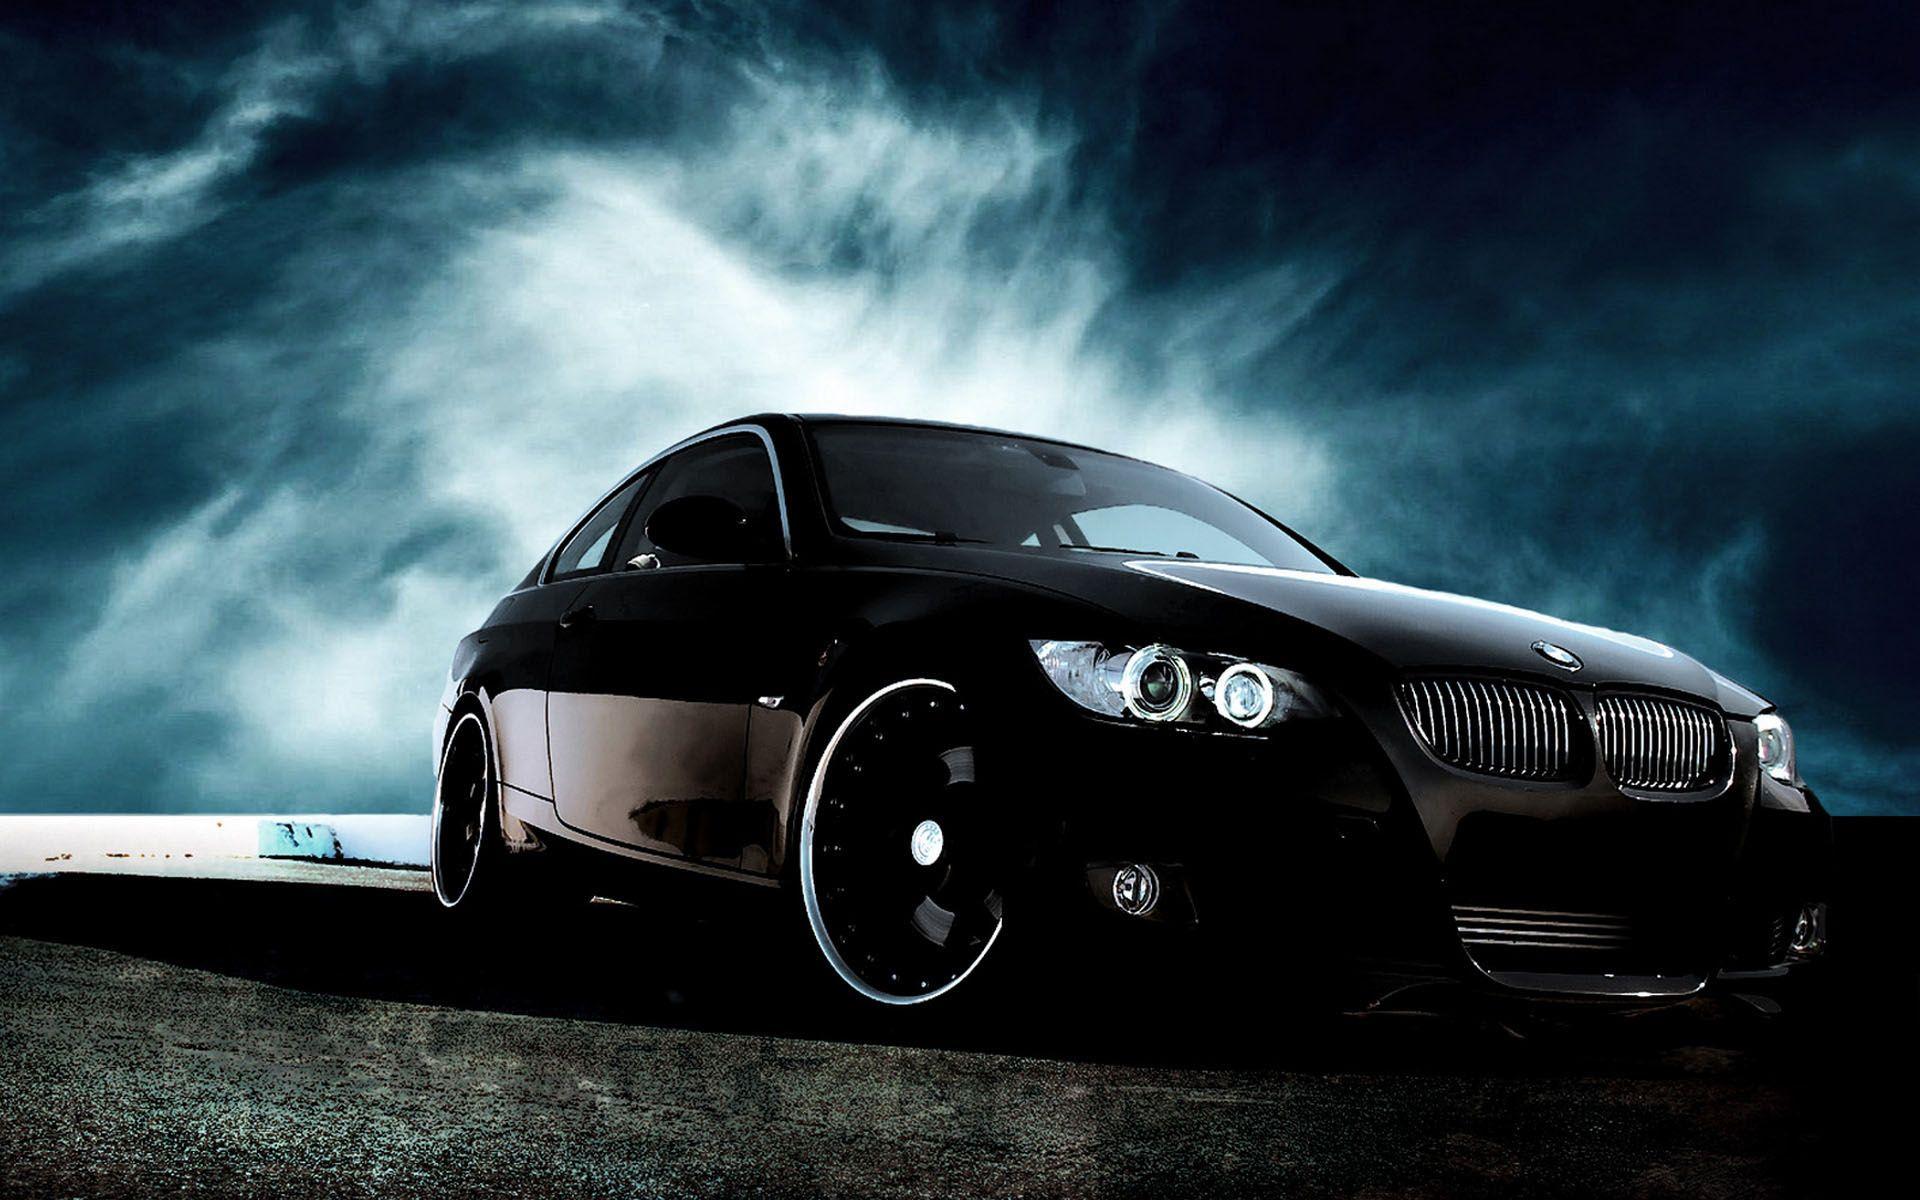 BMW Wallpapers Wallpapercraft (с изображениями